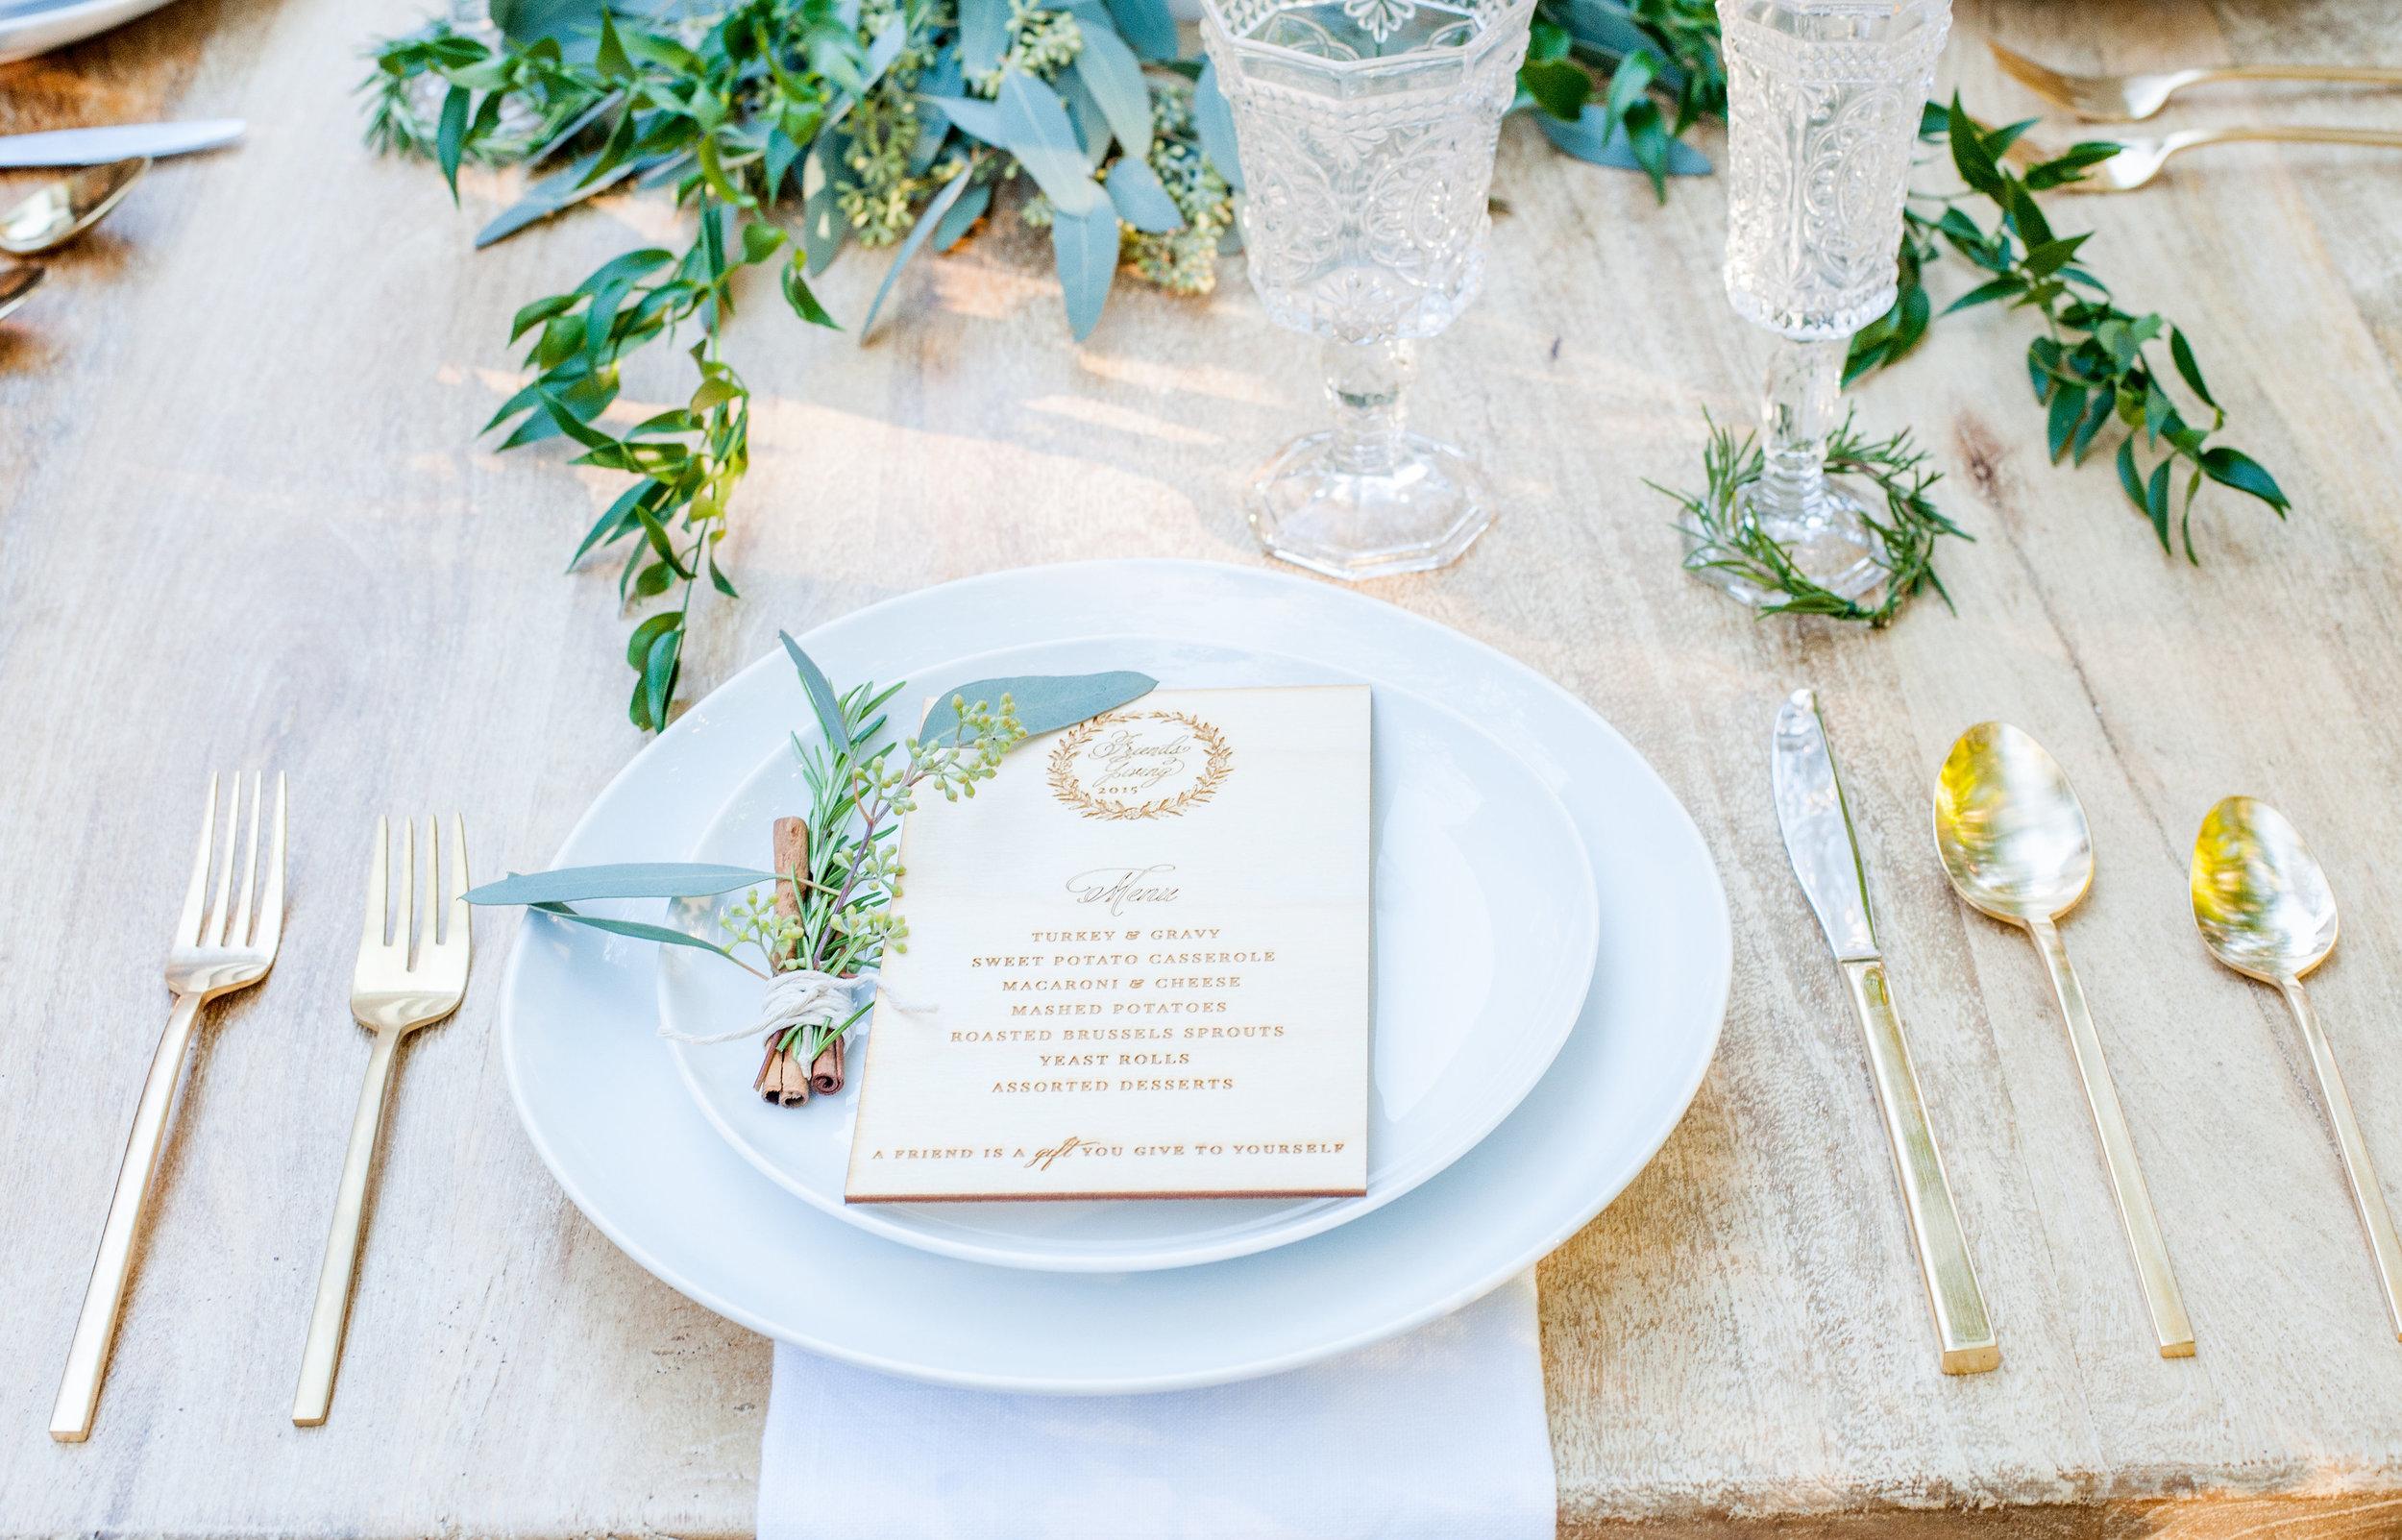 Thanksgivingdecor-Friendsgivingstyledshoot-outdoorliving-goldsilverware-foliage-cinnamon.jpg